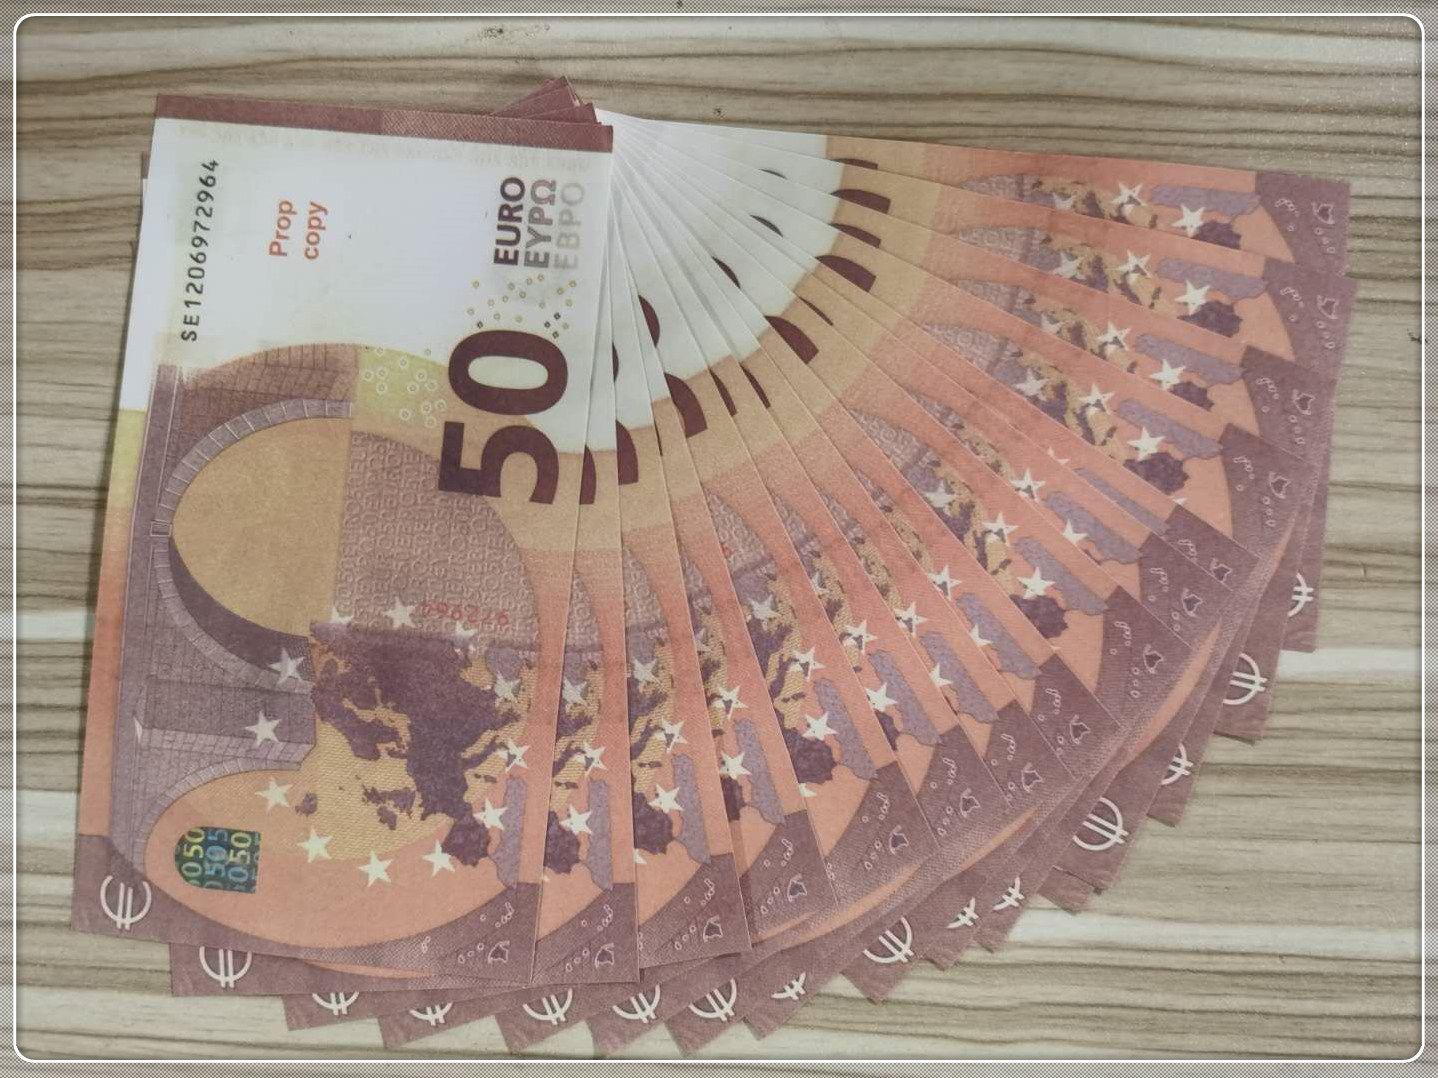 50 Bar Bar de la contrefaçon Banknote BFERE EURO TIMOING MV PARTIE DE LA PARTIE DE LA PARTIE DE LA PARTIE PROPAGNE LE50-43 COPY PROP RAJUF